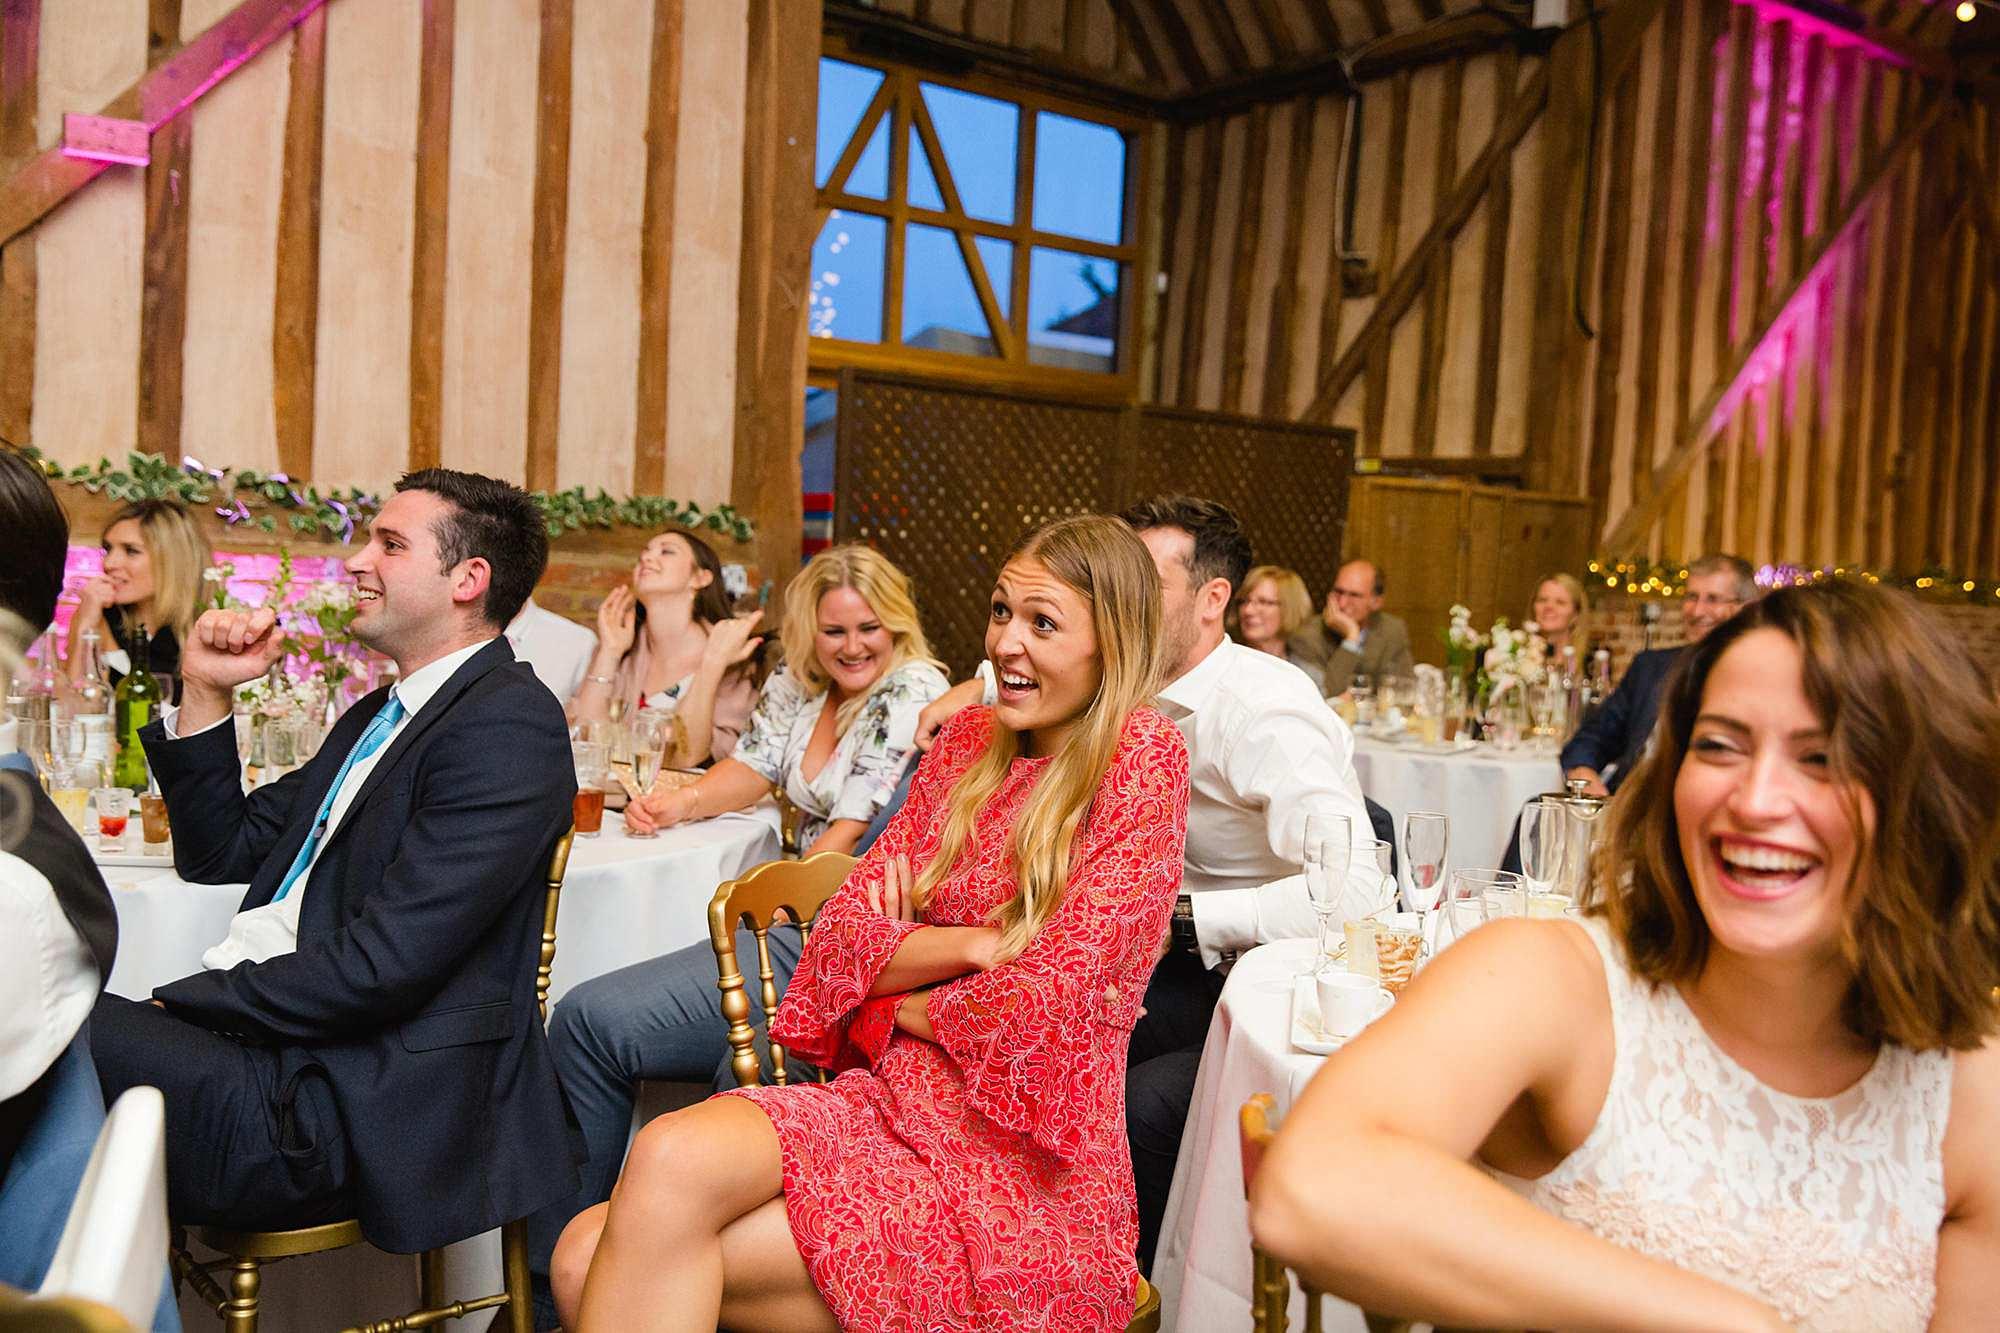 Lillibrooke Manor wedding guest reaction to best man's video speech